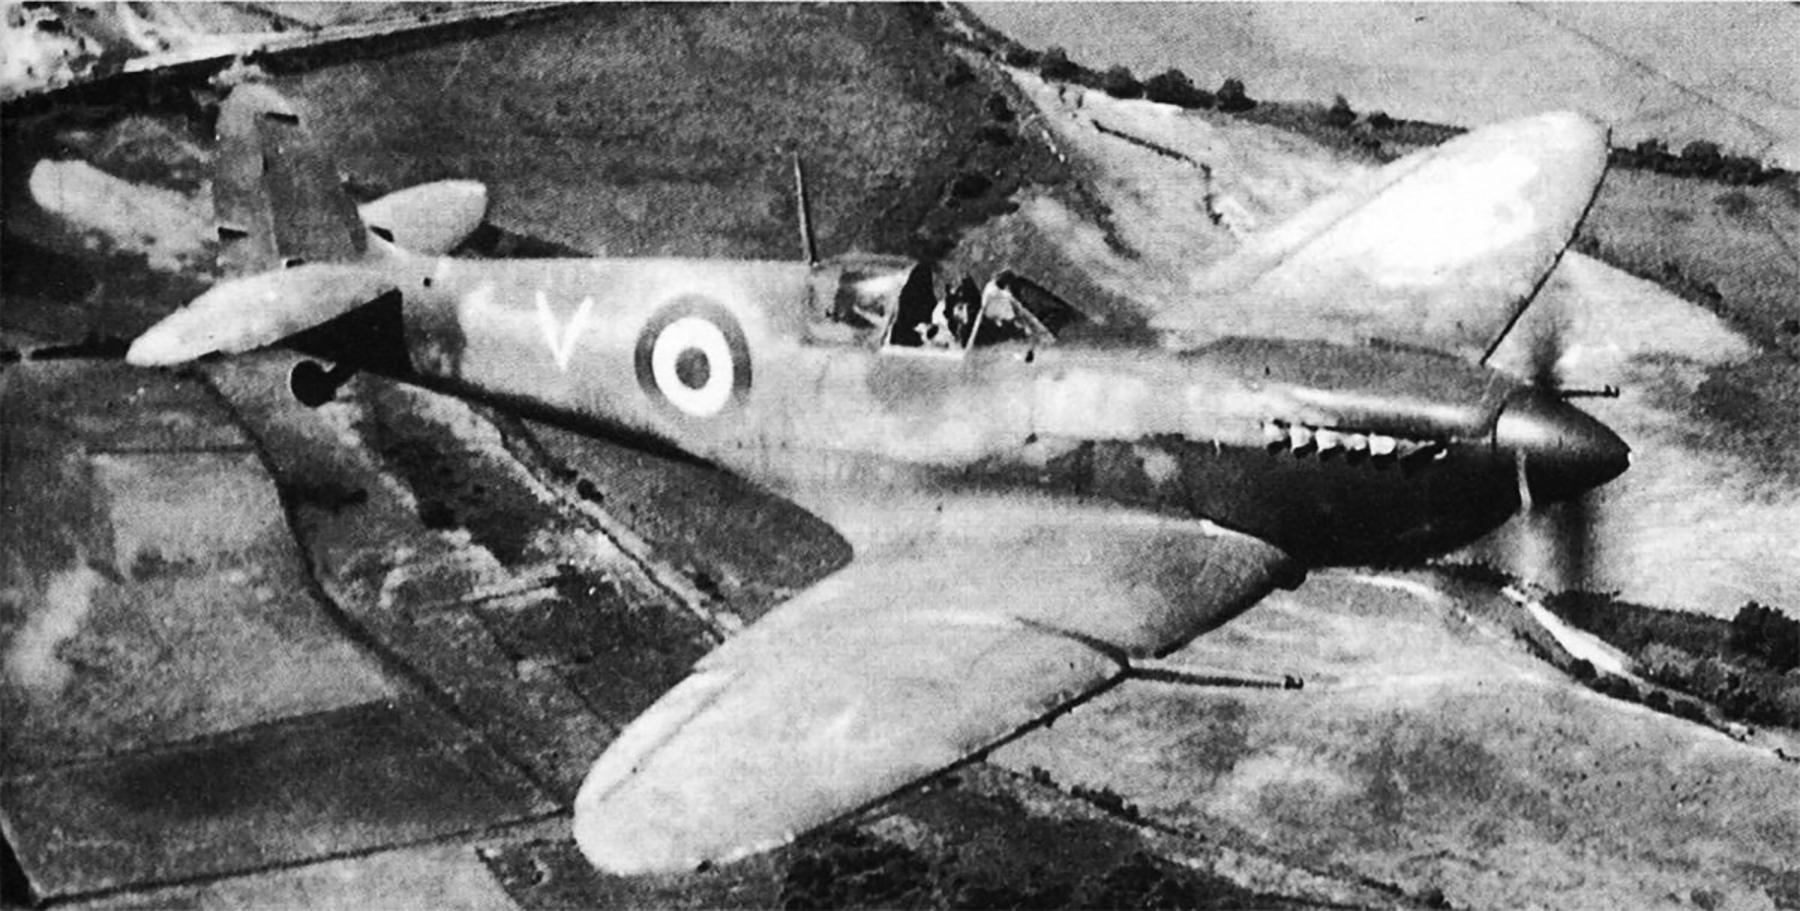 Spitfire MkIX RAF 326Sqn GC II.7 V EP813 near Corsica Military Revue Sep 2013 Page 7